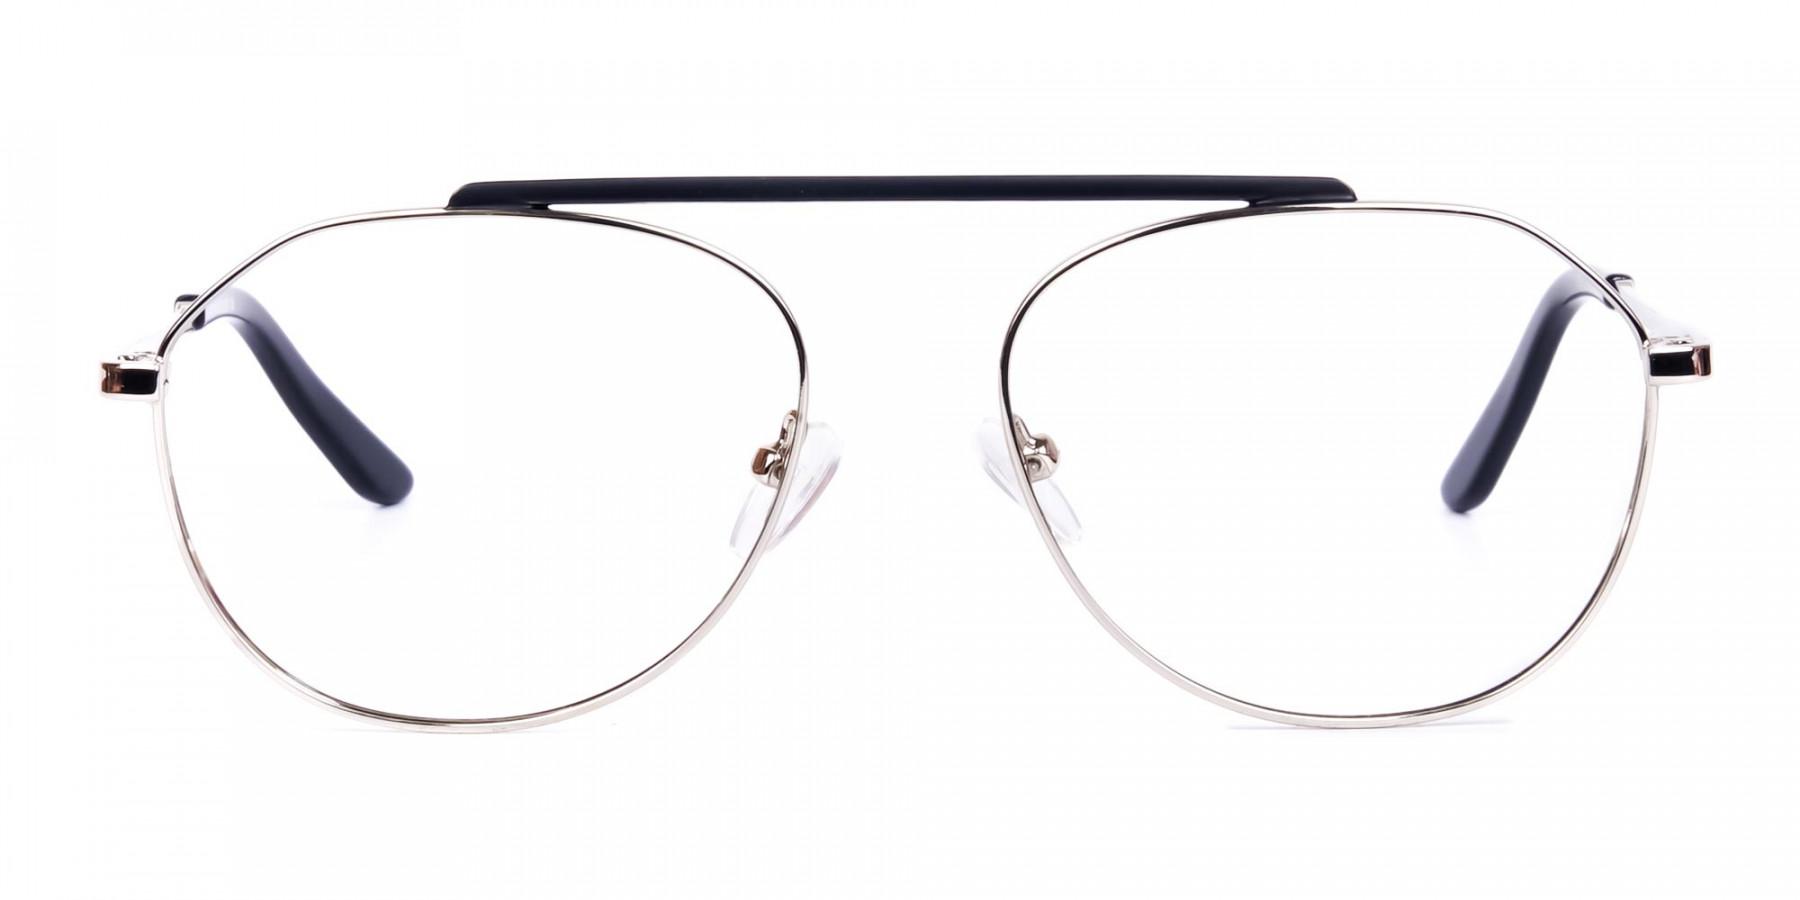 Black-Silver-Aviator-Glasses-1